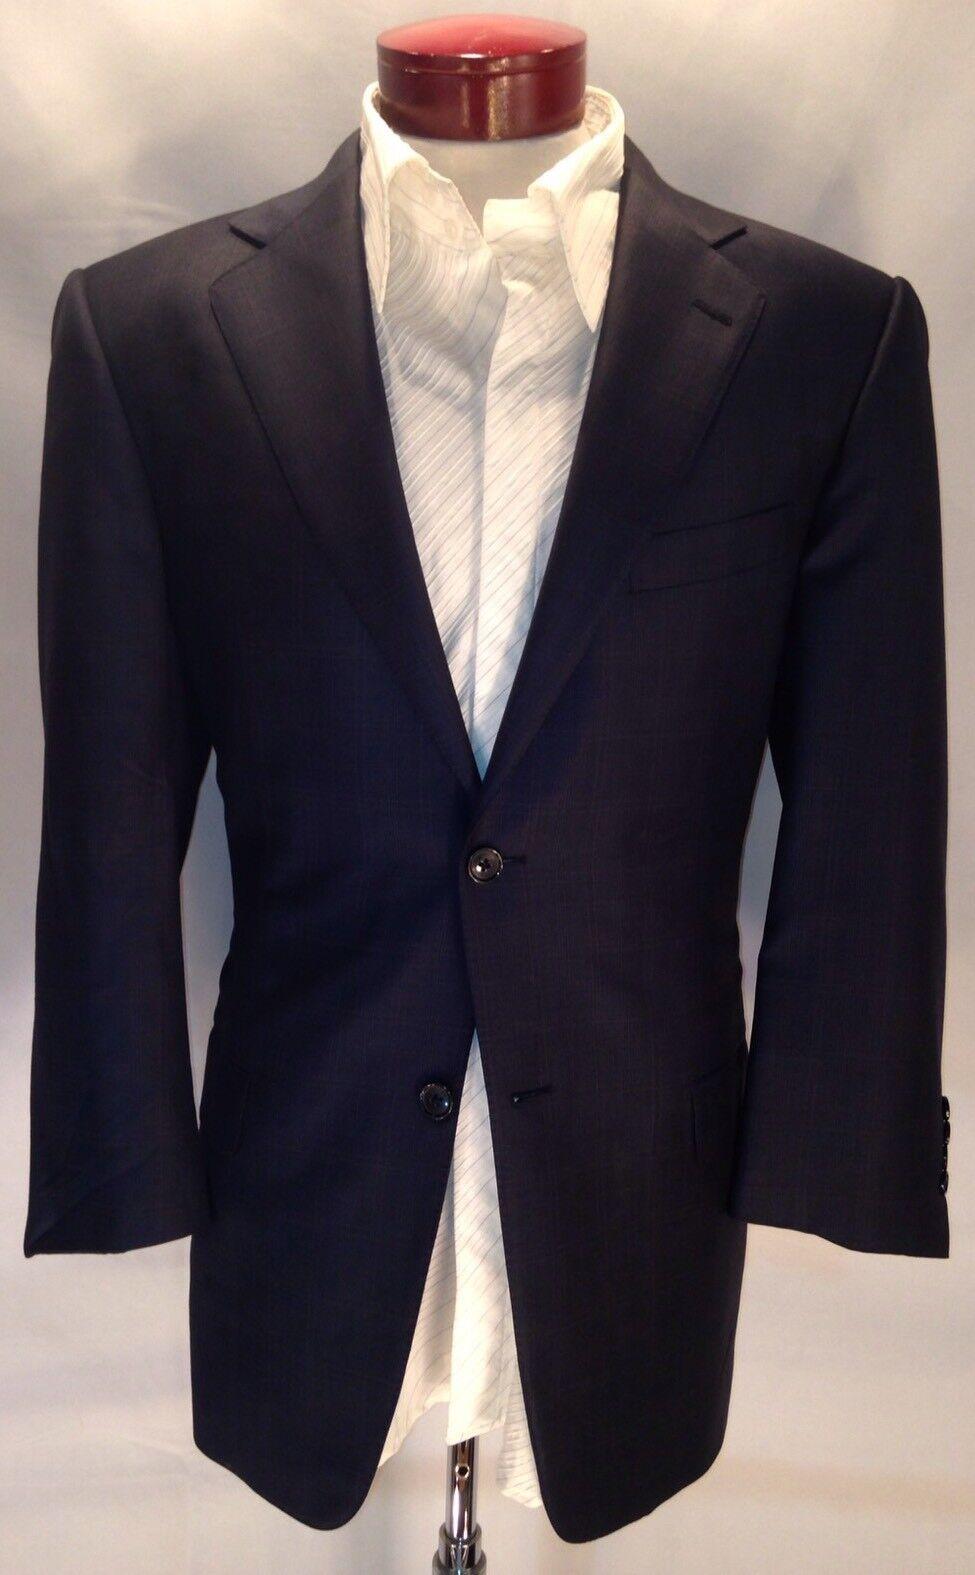 E203 Ermenegildo Zegna Trofeo Navy Windowpane 100% Wool Suit 40R Made In